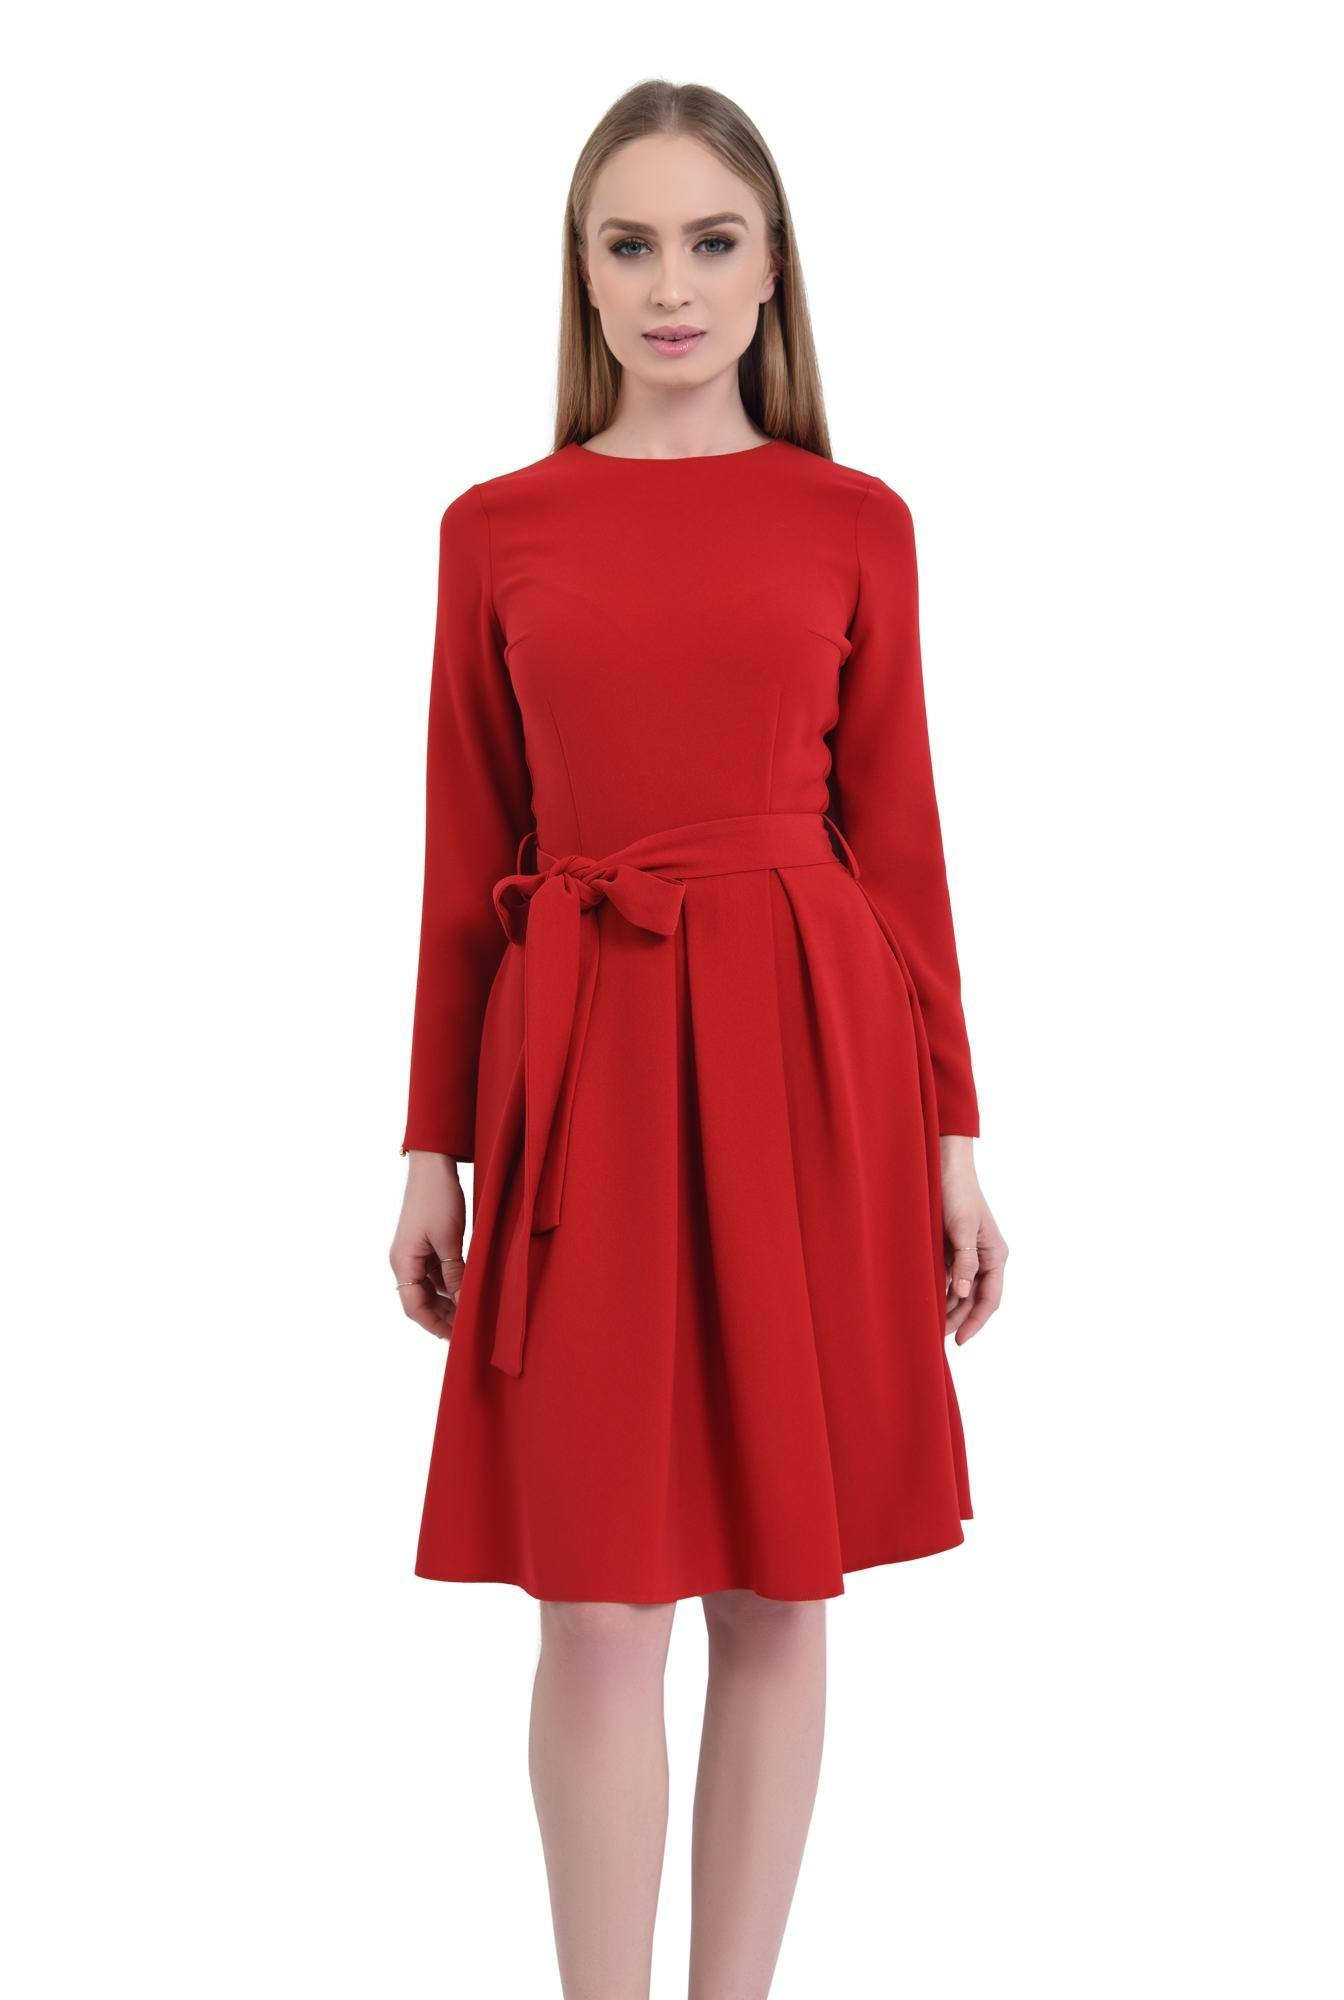 0 - rochie casual, midi, plisata, cordon, rosu